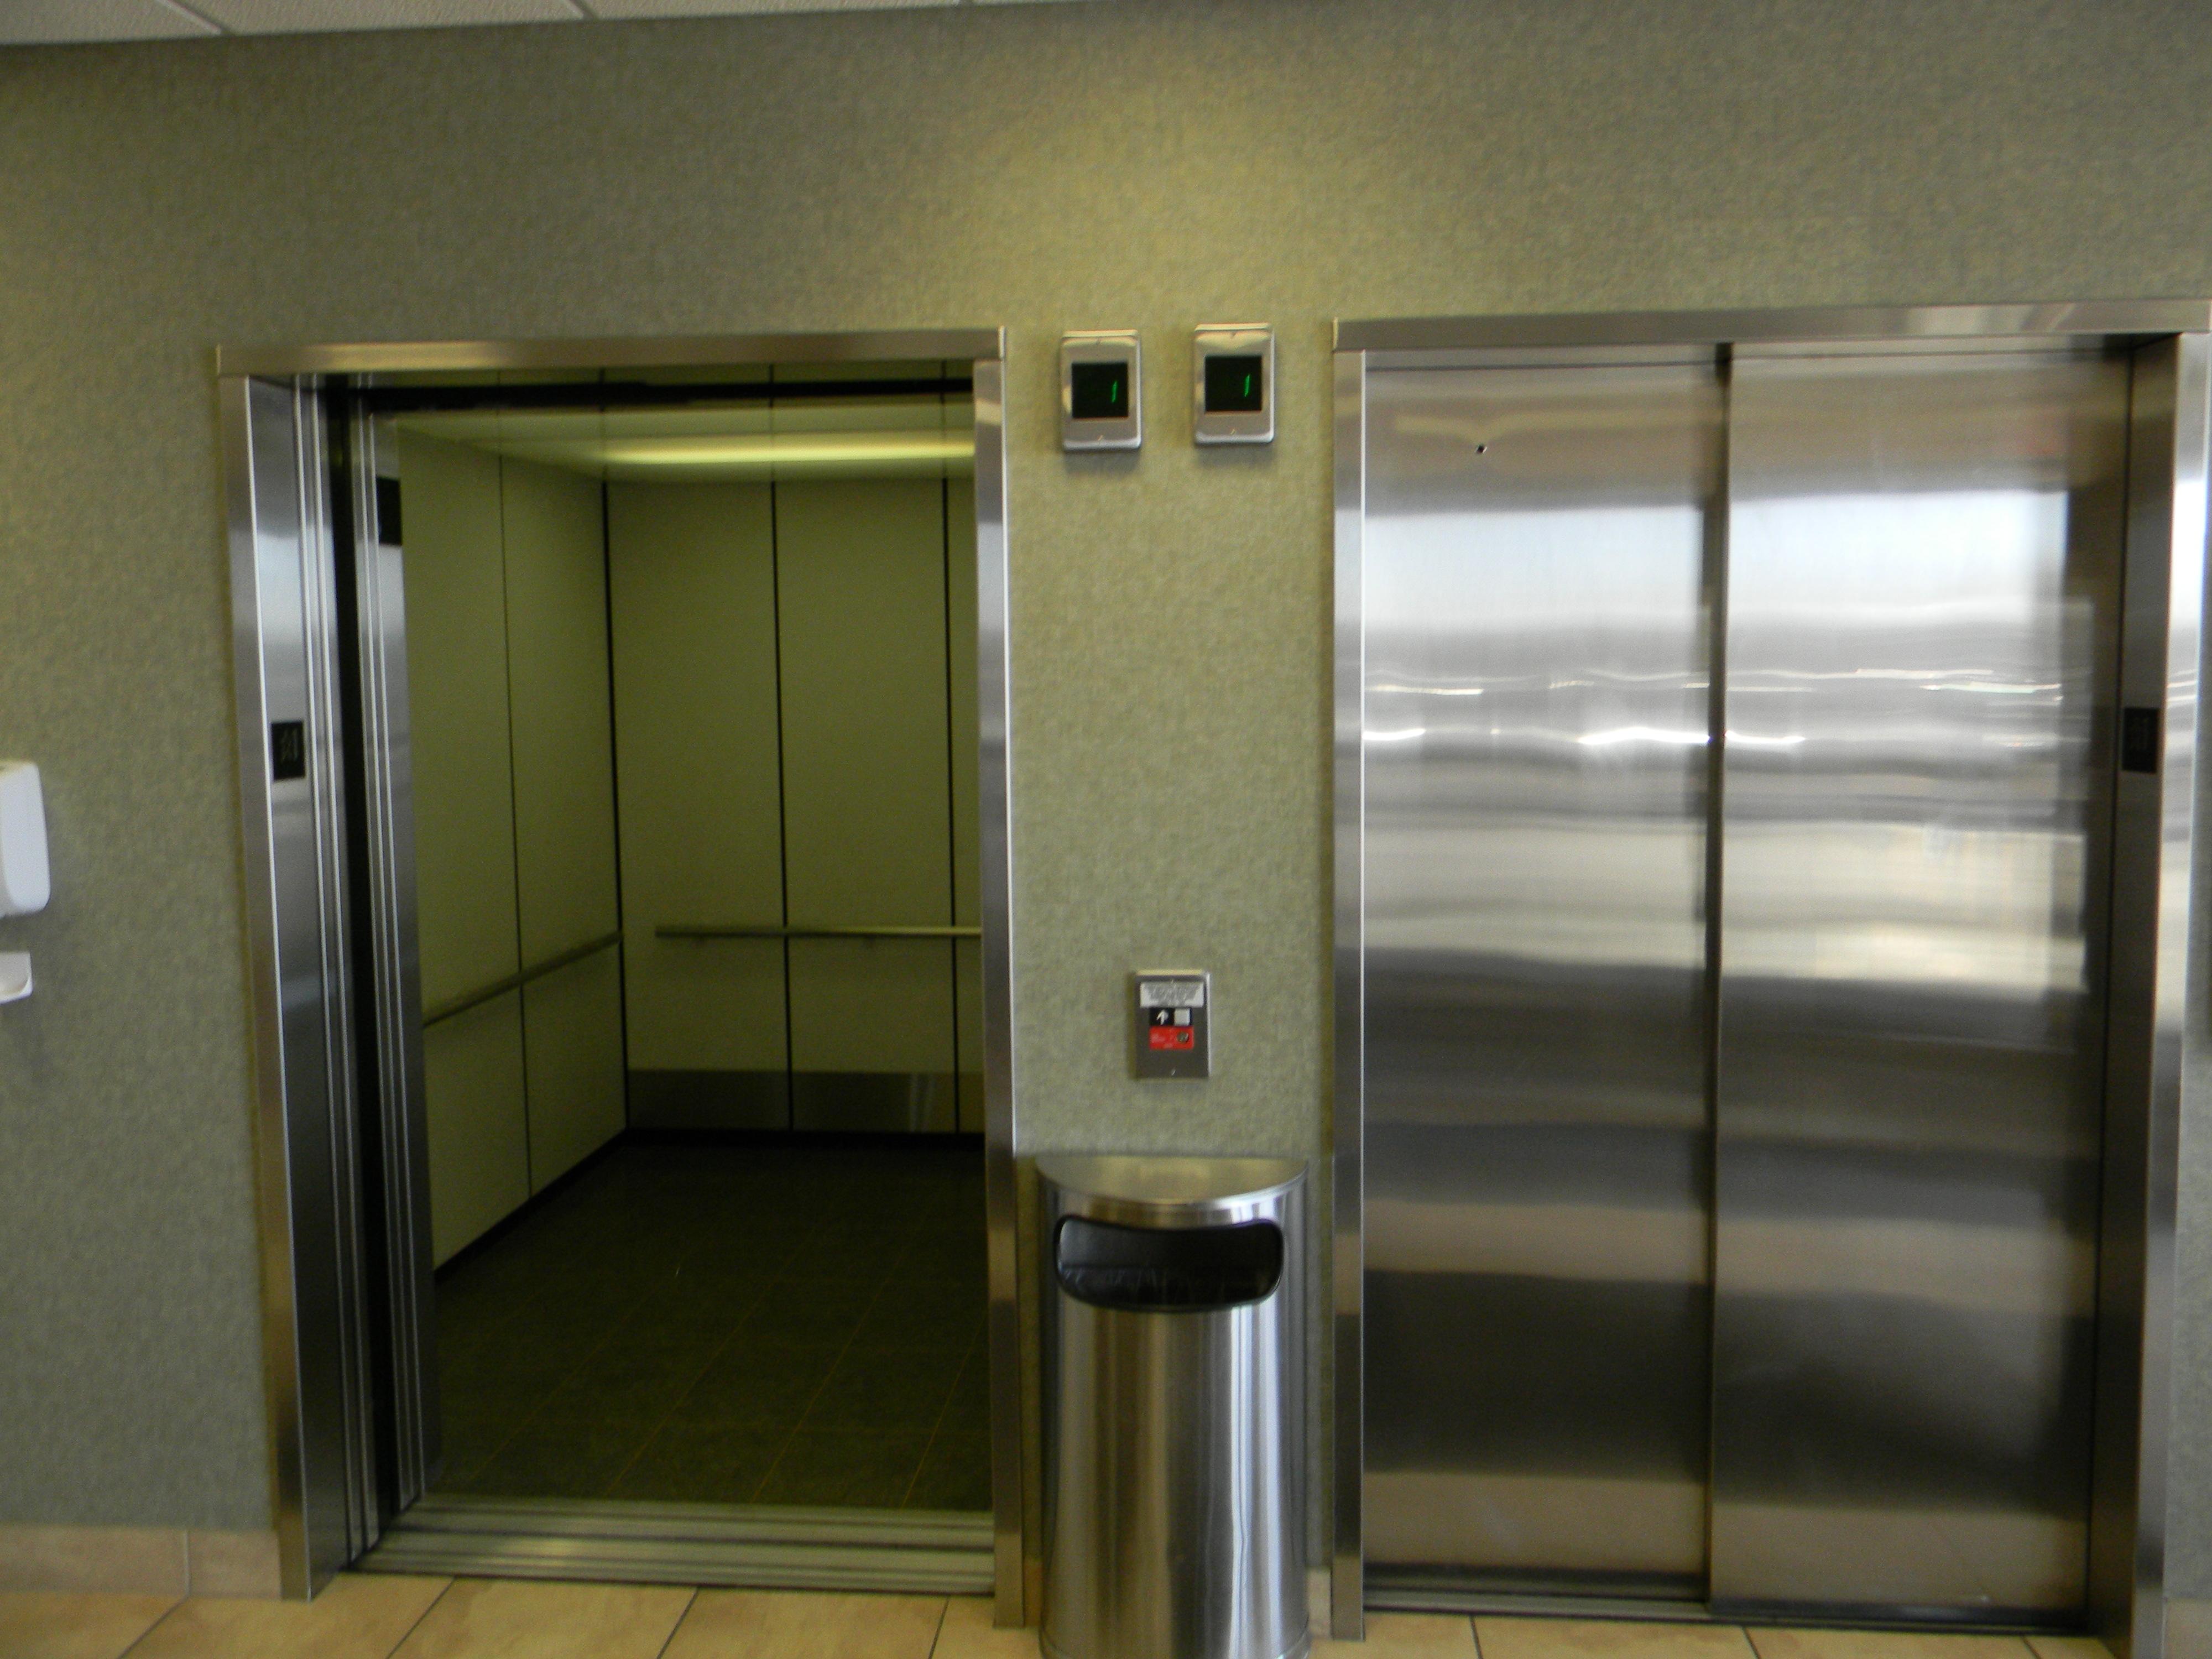 Klost Elevator Cab Renovations